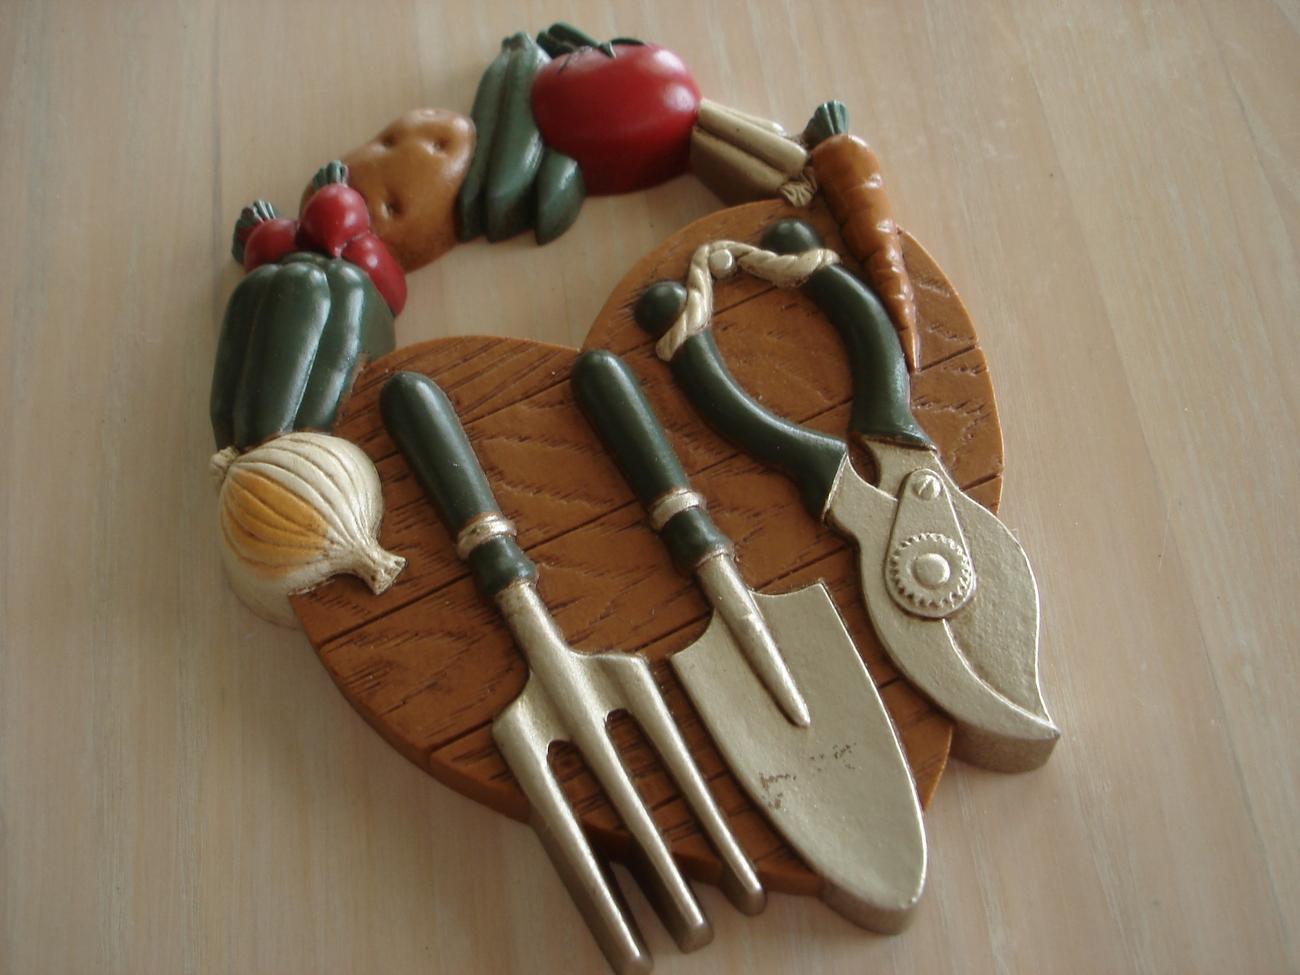 Home interiors garden tools vegetables heart wall plaque for Vegetable garden tools